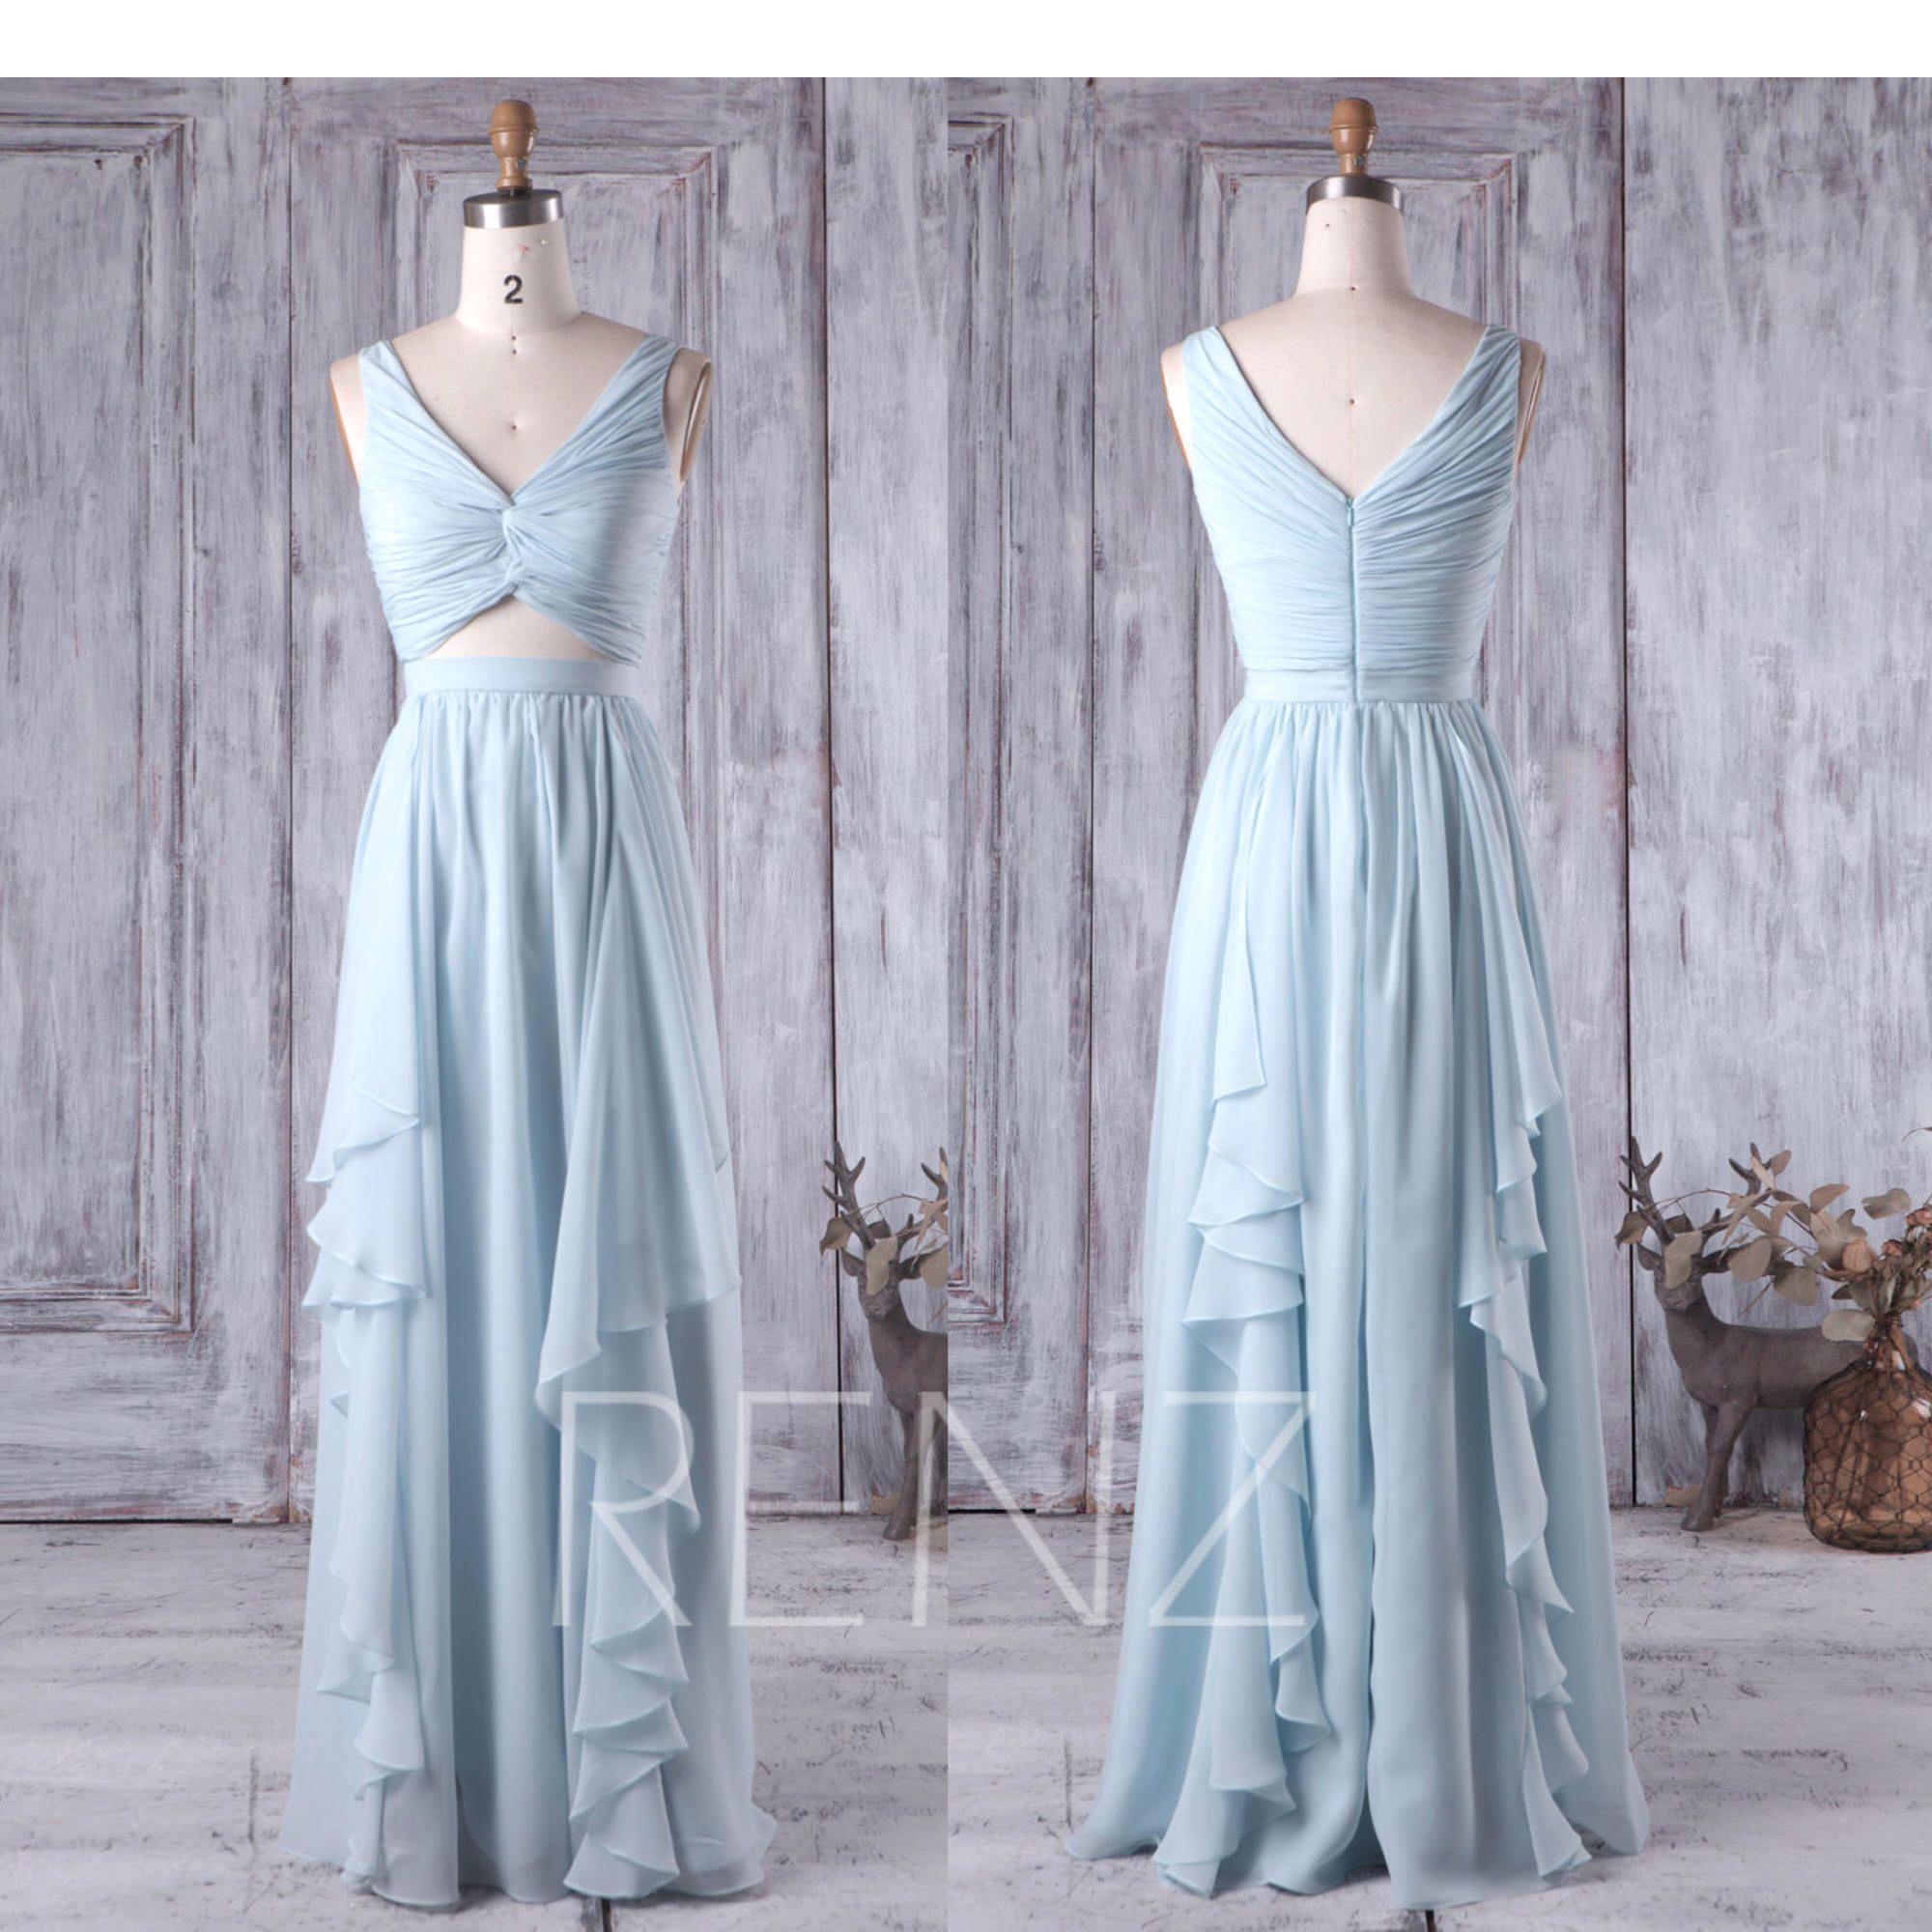 light amalia blue dresses lighting bridesmaid in shown style